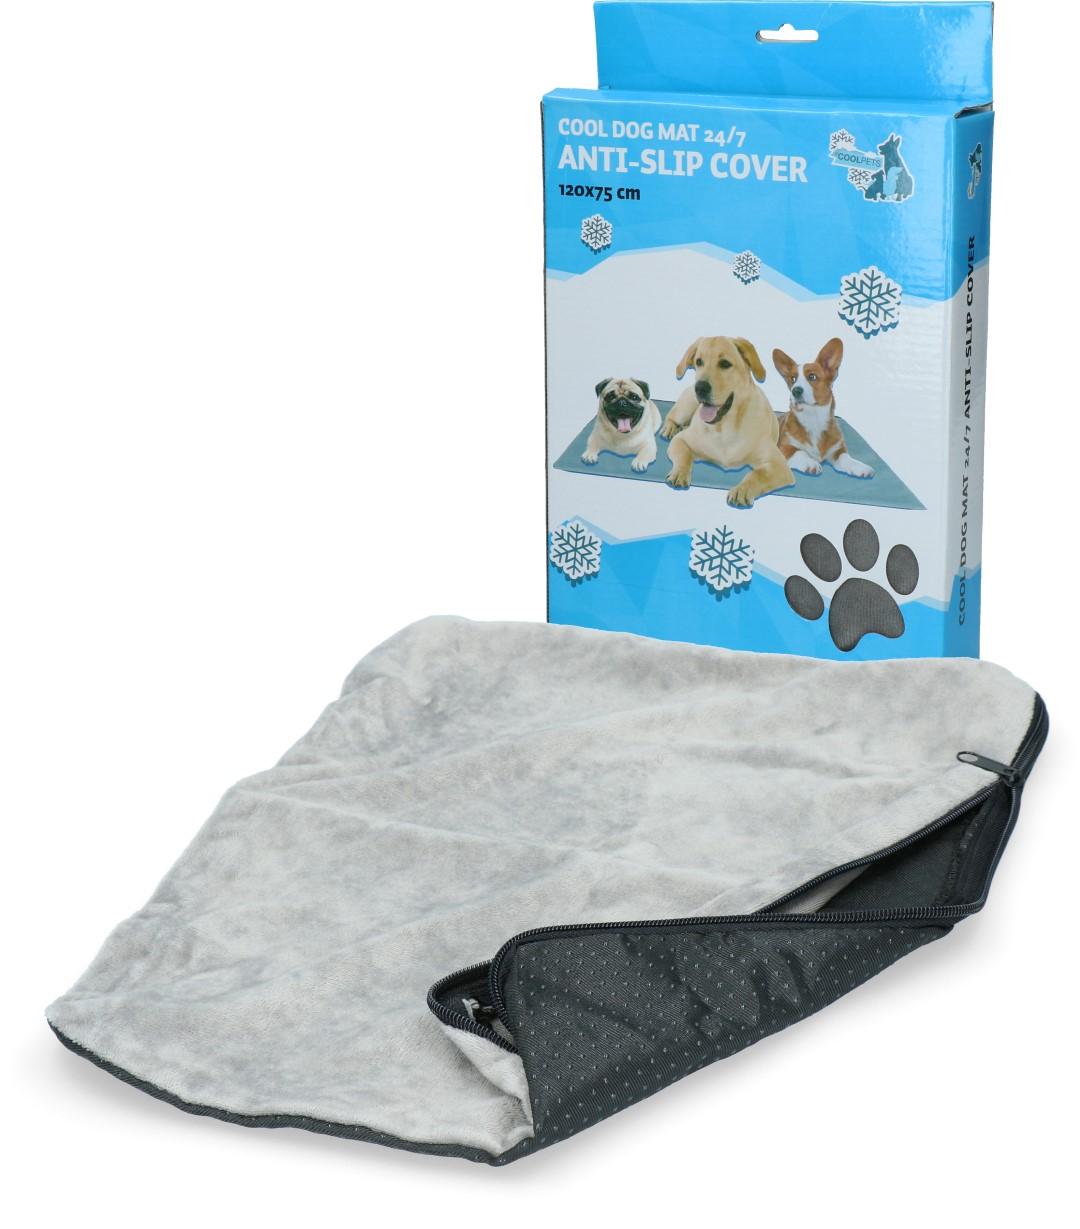 CoolPets Dog Mat 24/7 Anti-Slip Cover (120x75cm) XL